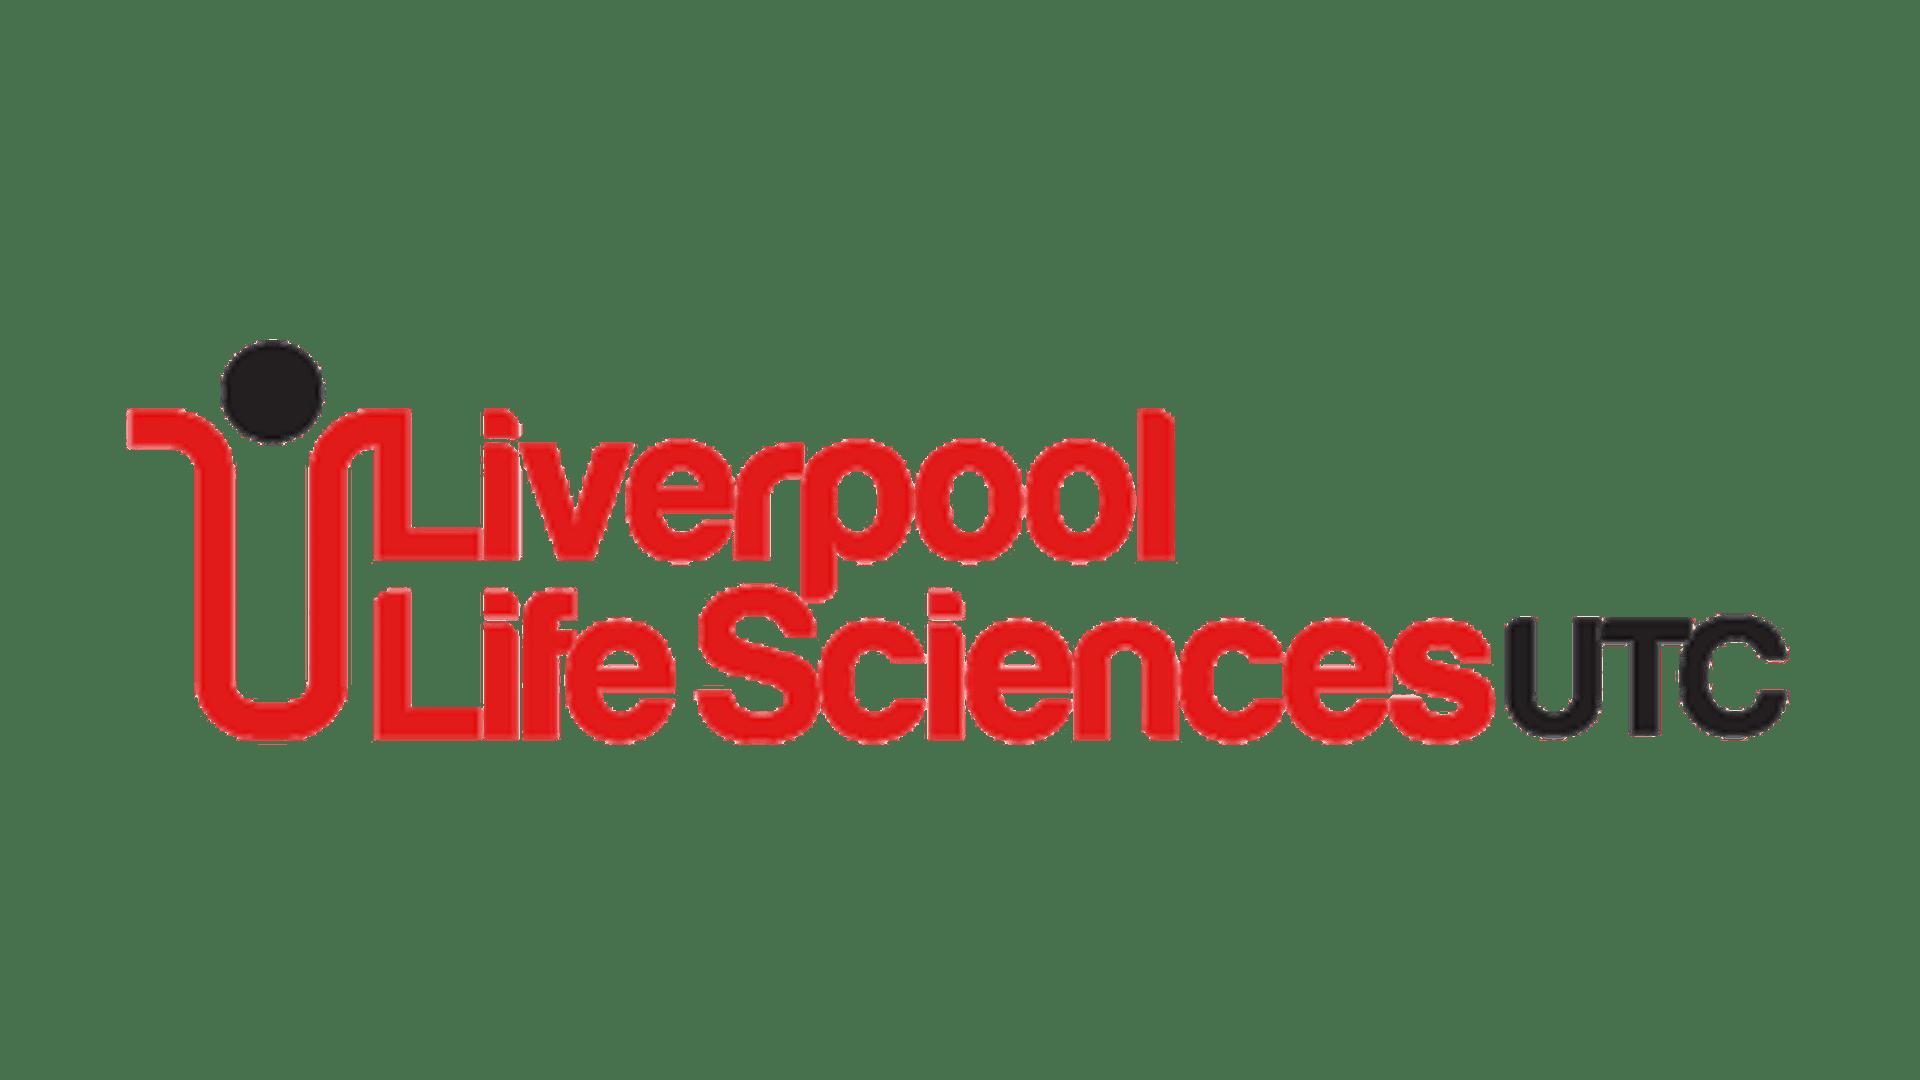 Liverpool Life Sciences UTC 1